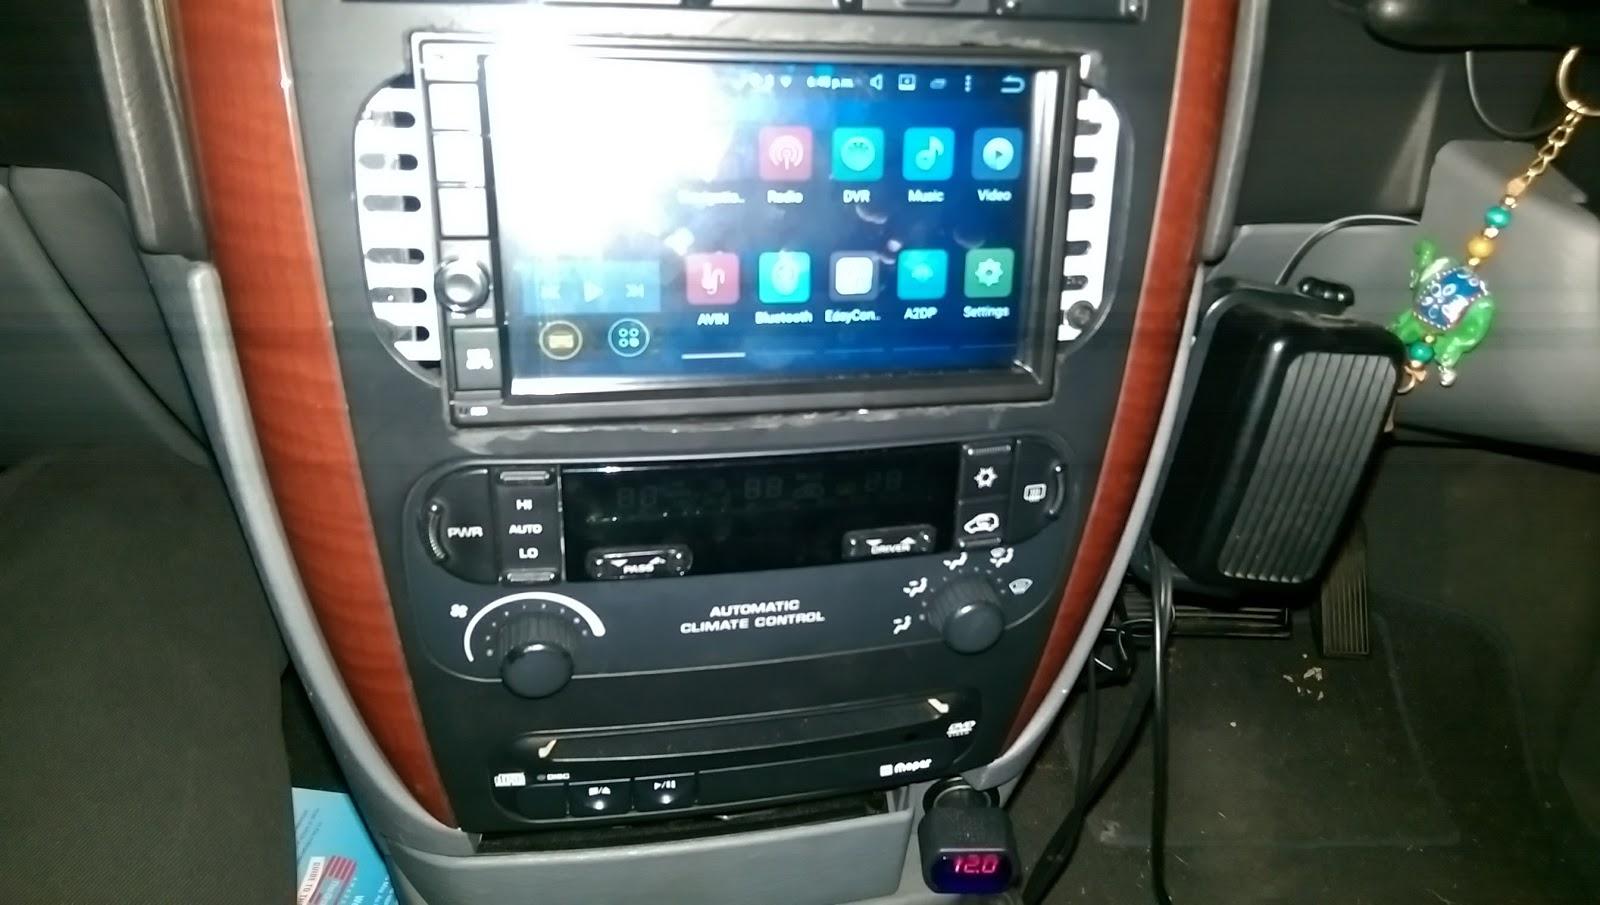 Andy Brown's blog: Hizpo Android car head unit MTCD_XRC sofia3gr